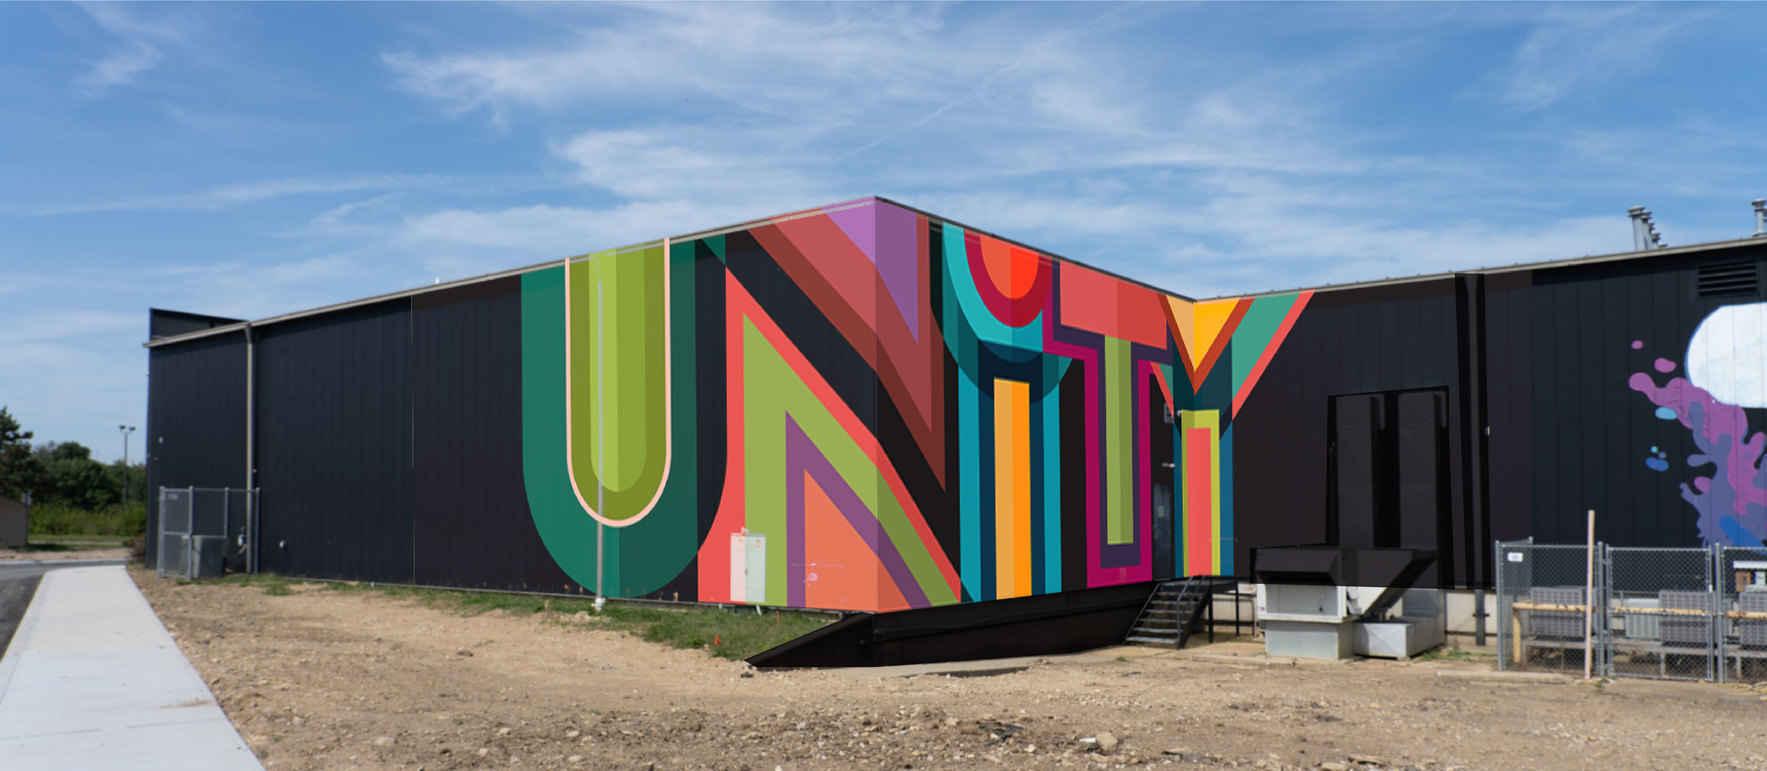 ACPA ChalkFest Unity Sponsorship image